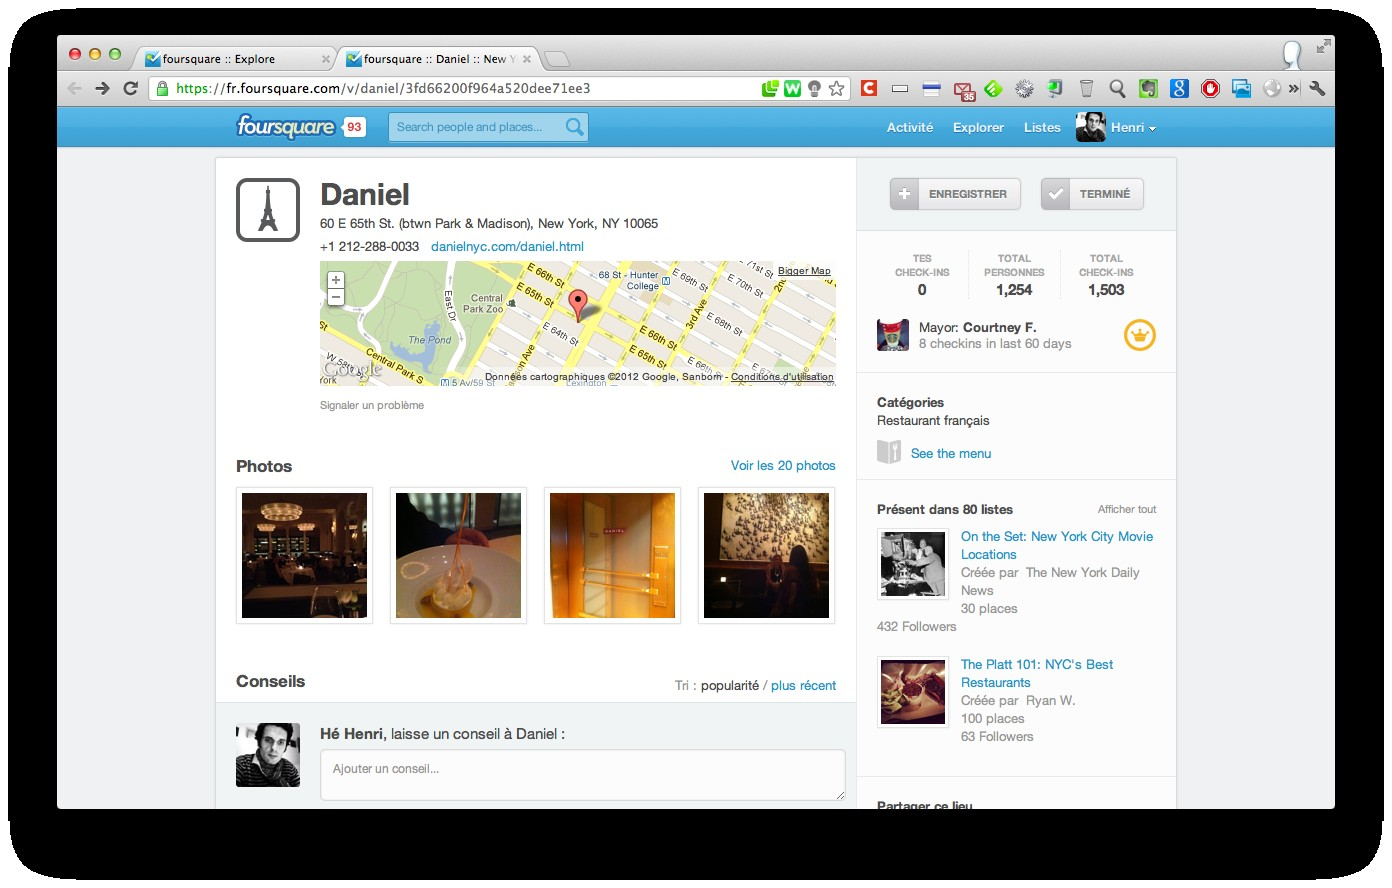 foursquare-menu